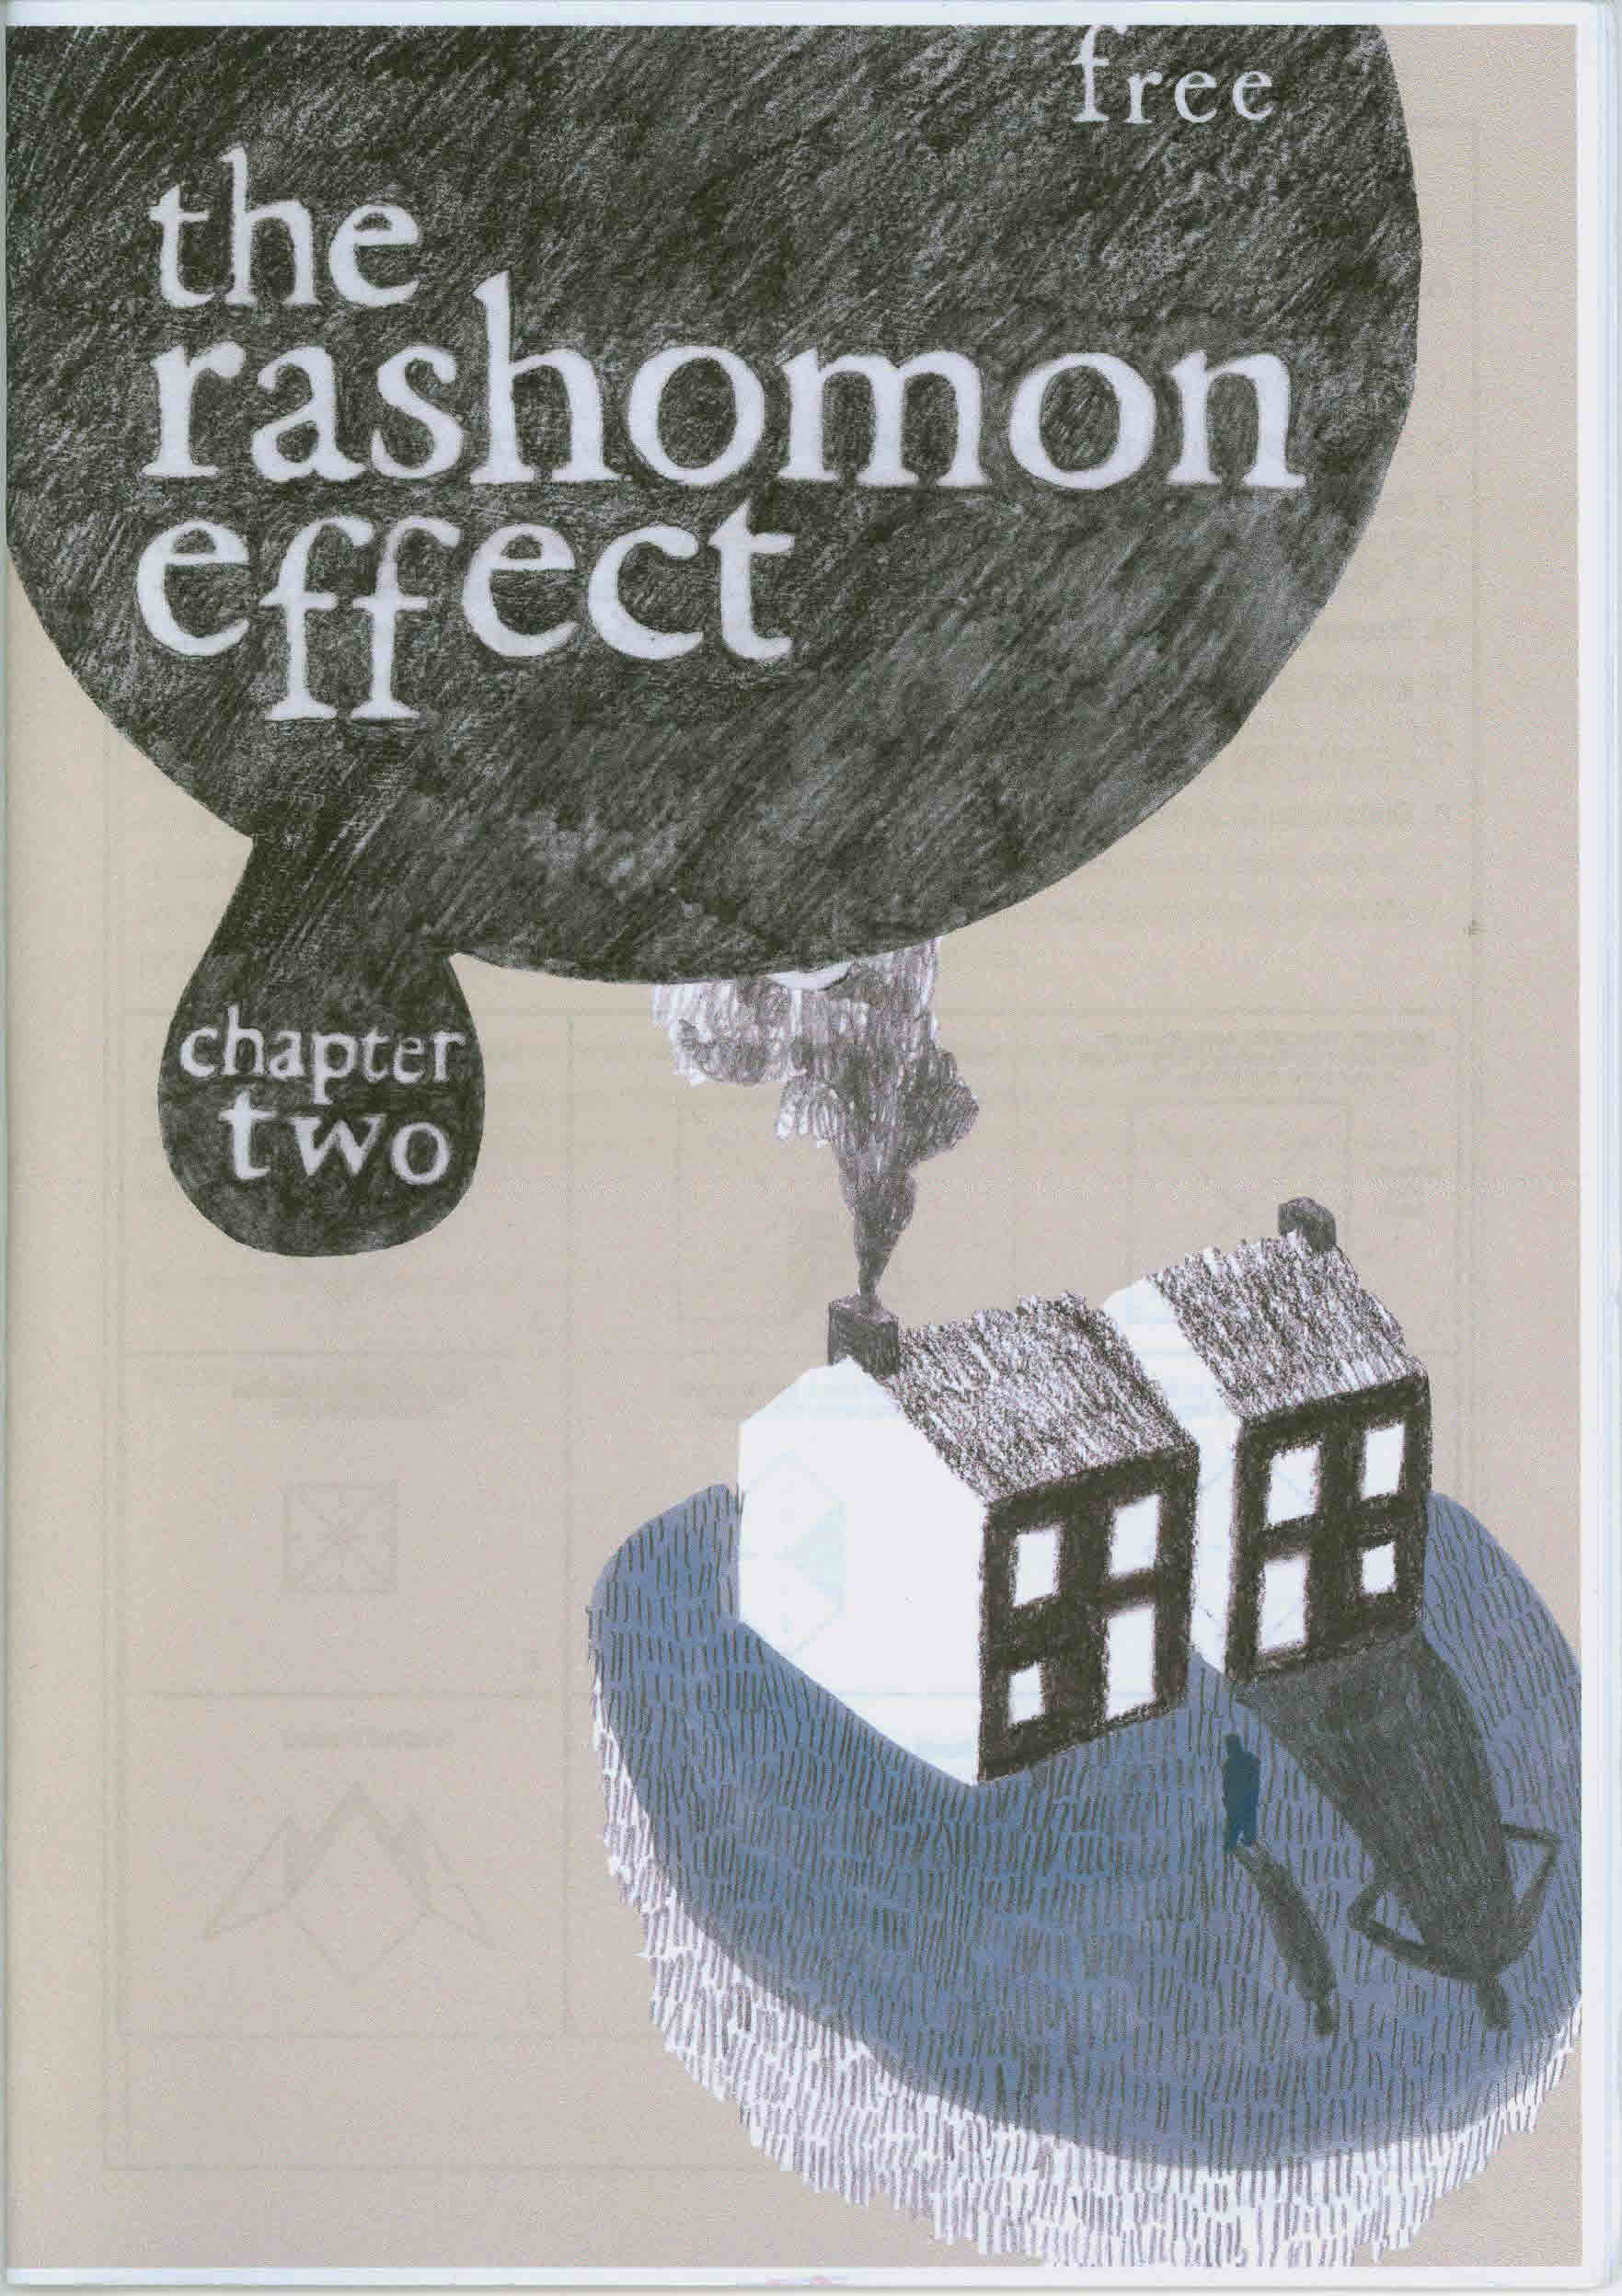 The rashomon effect – 2